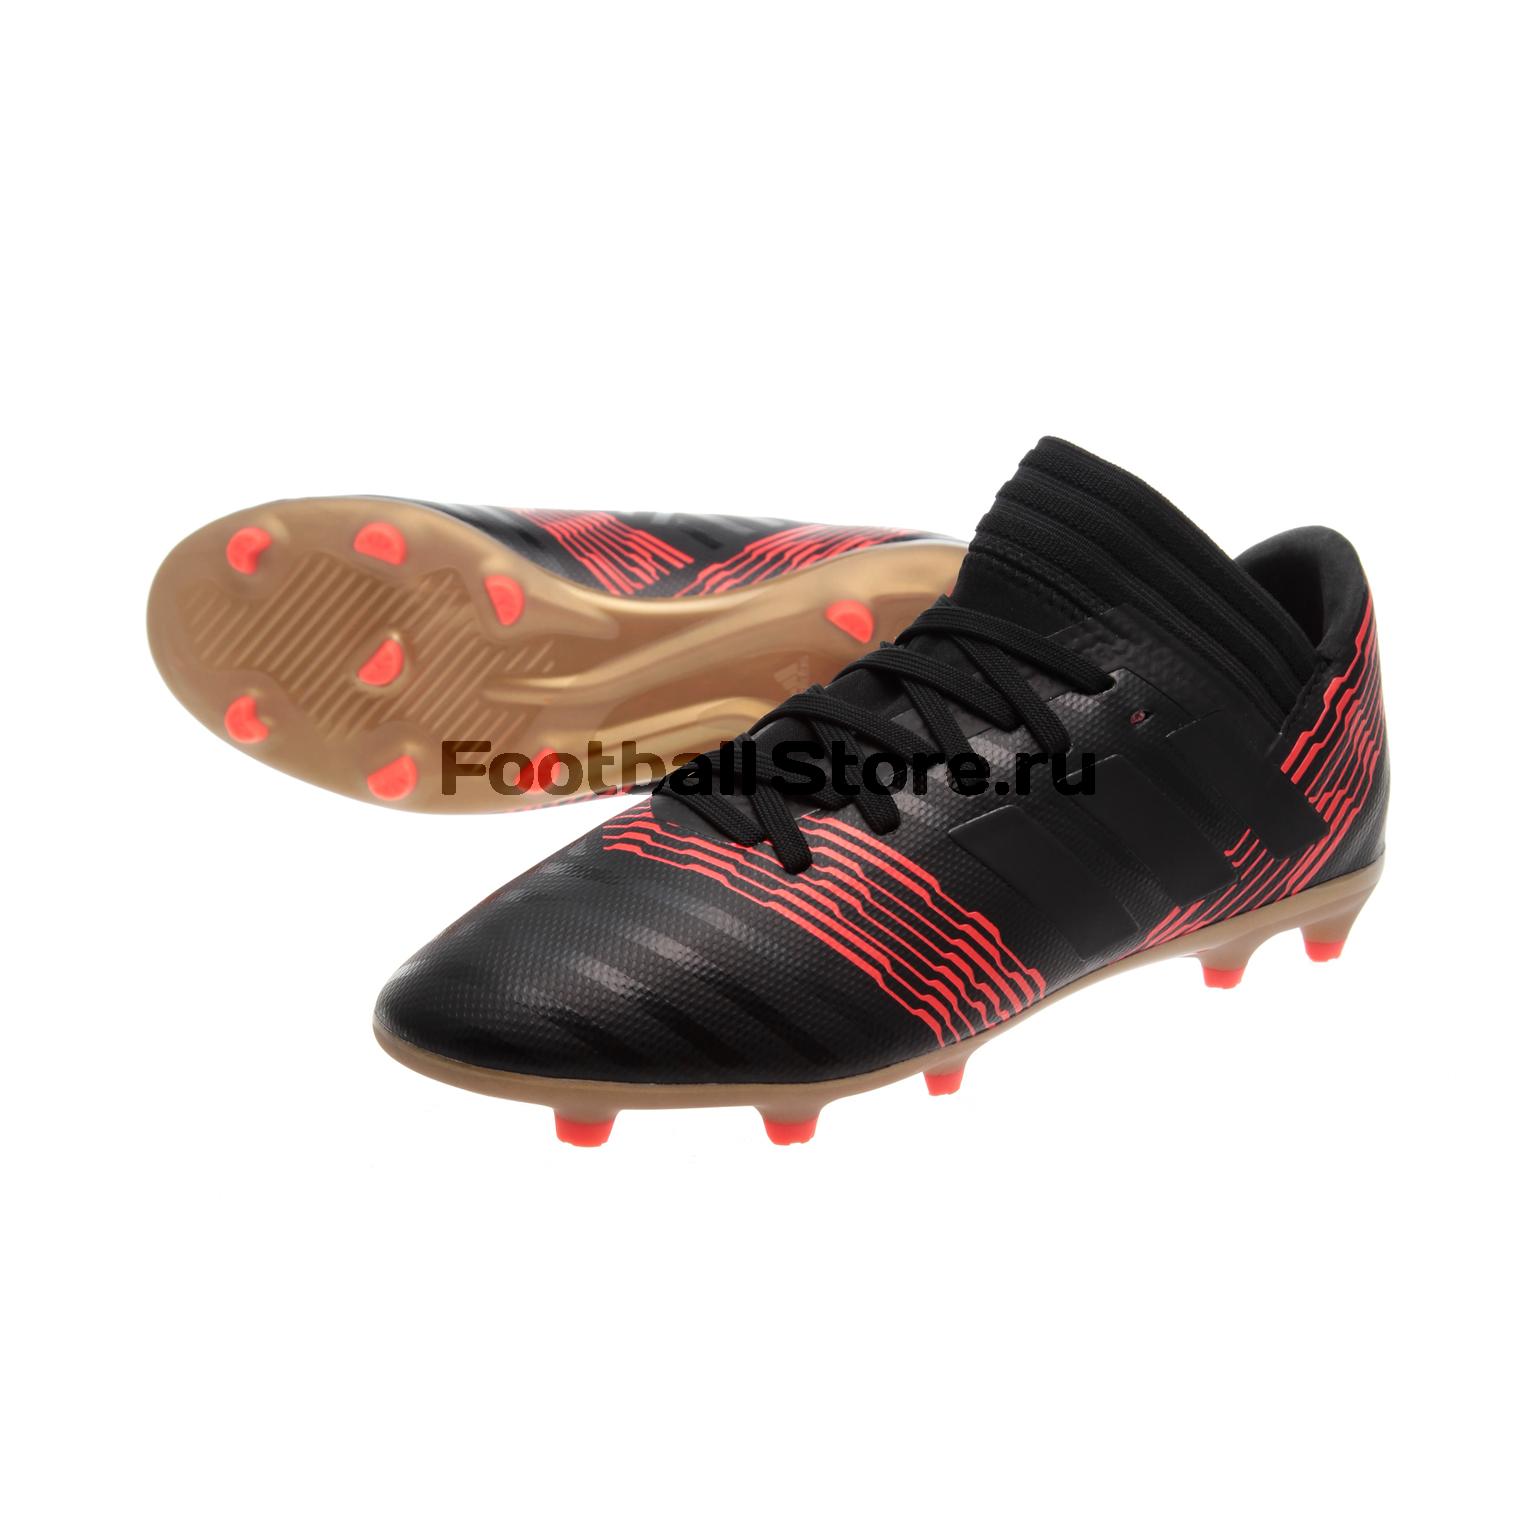 Бутсы Adidas Nemeziz 17.3 FG JR CP9165 бутсы adidas бутсы